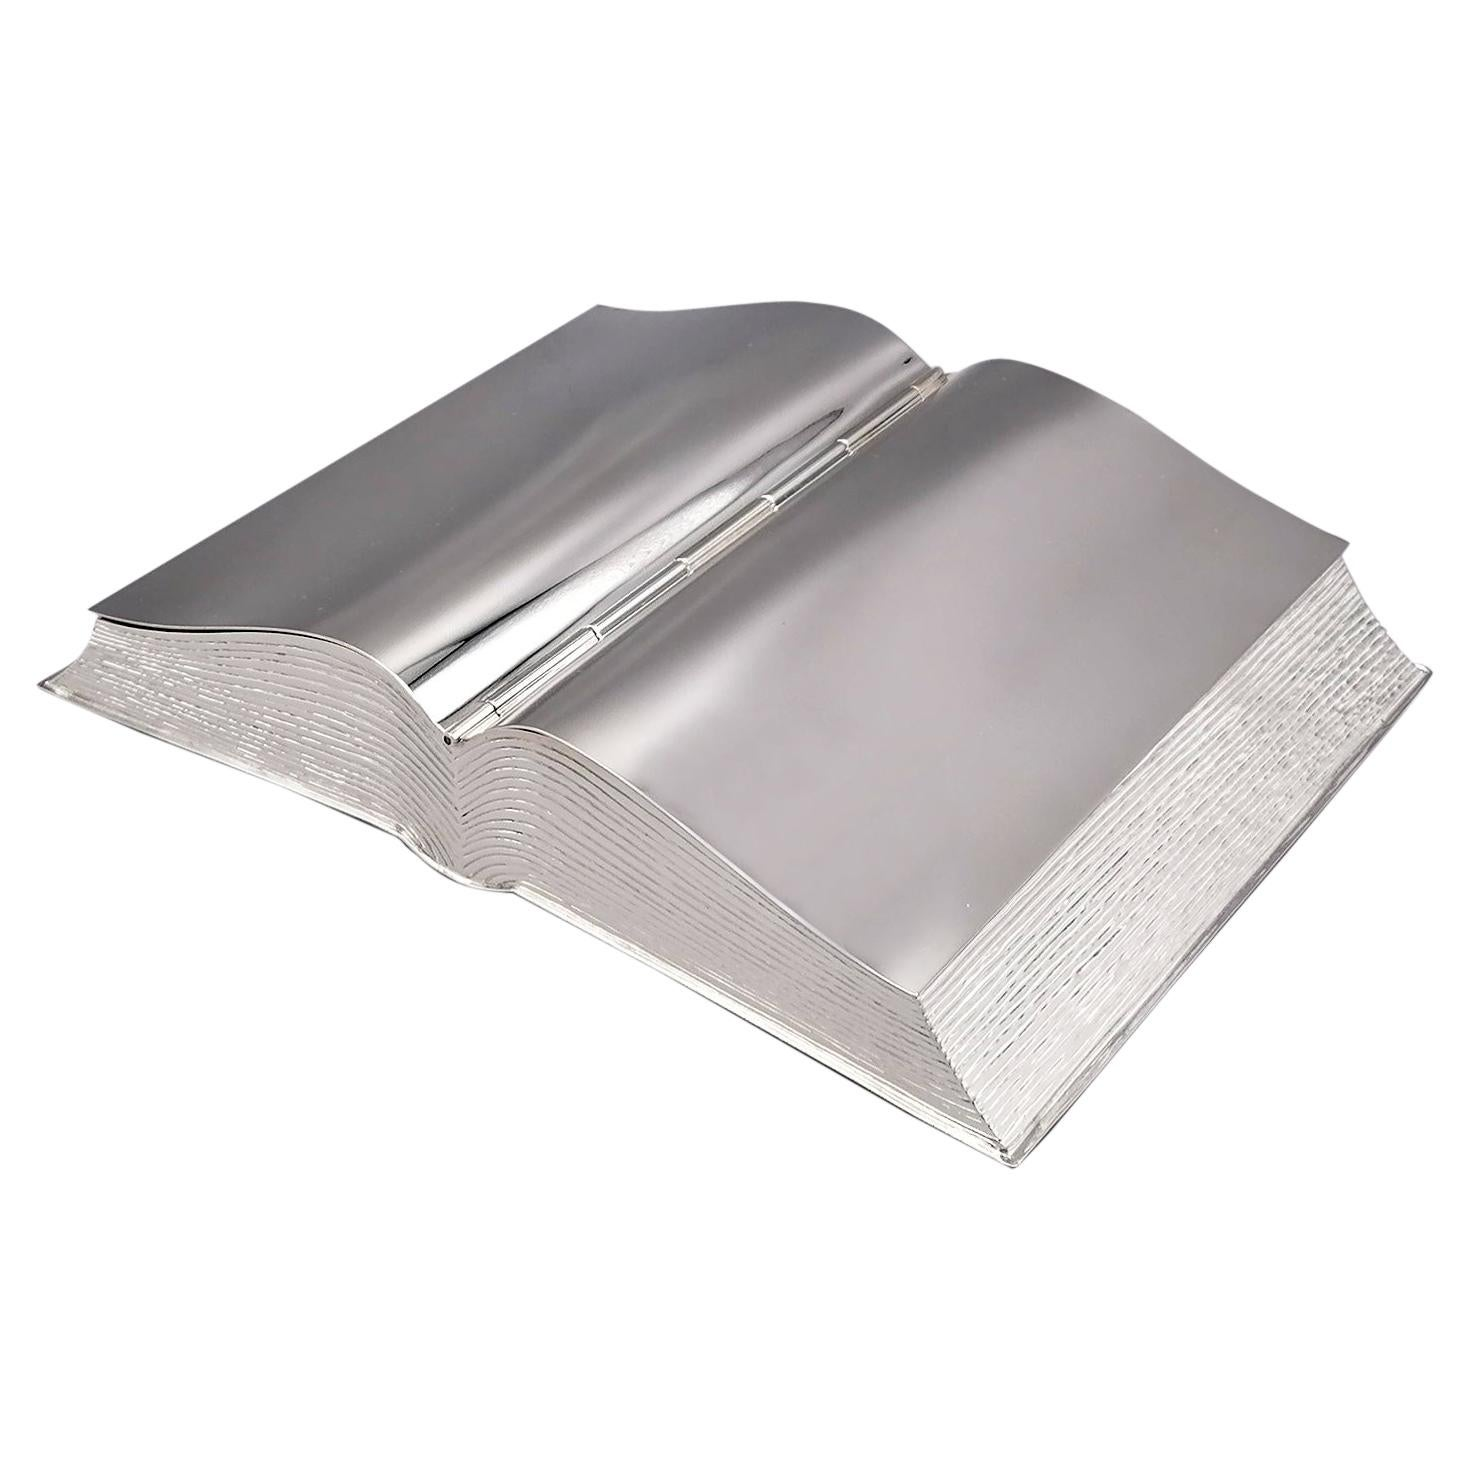 20th Century Italian Sterling Silver Box Book Shape